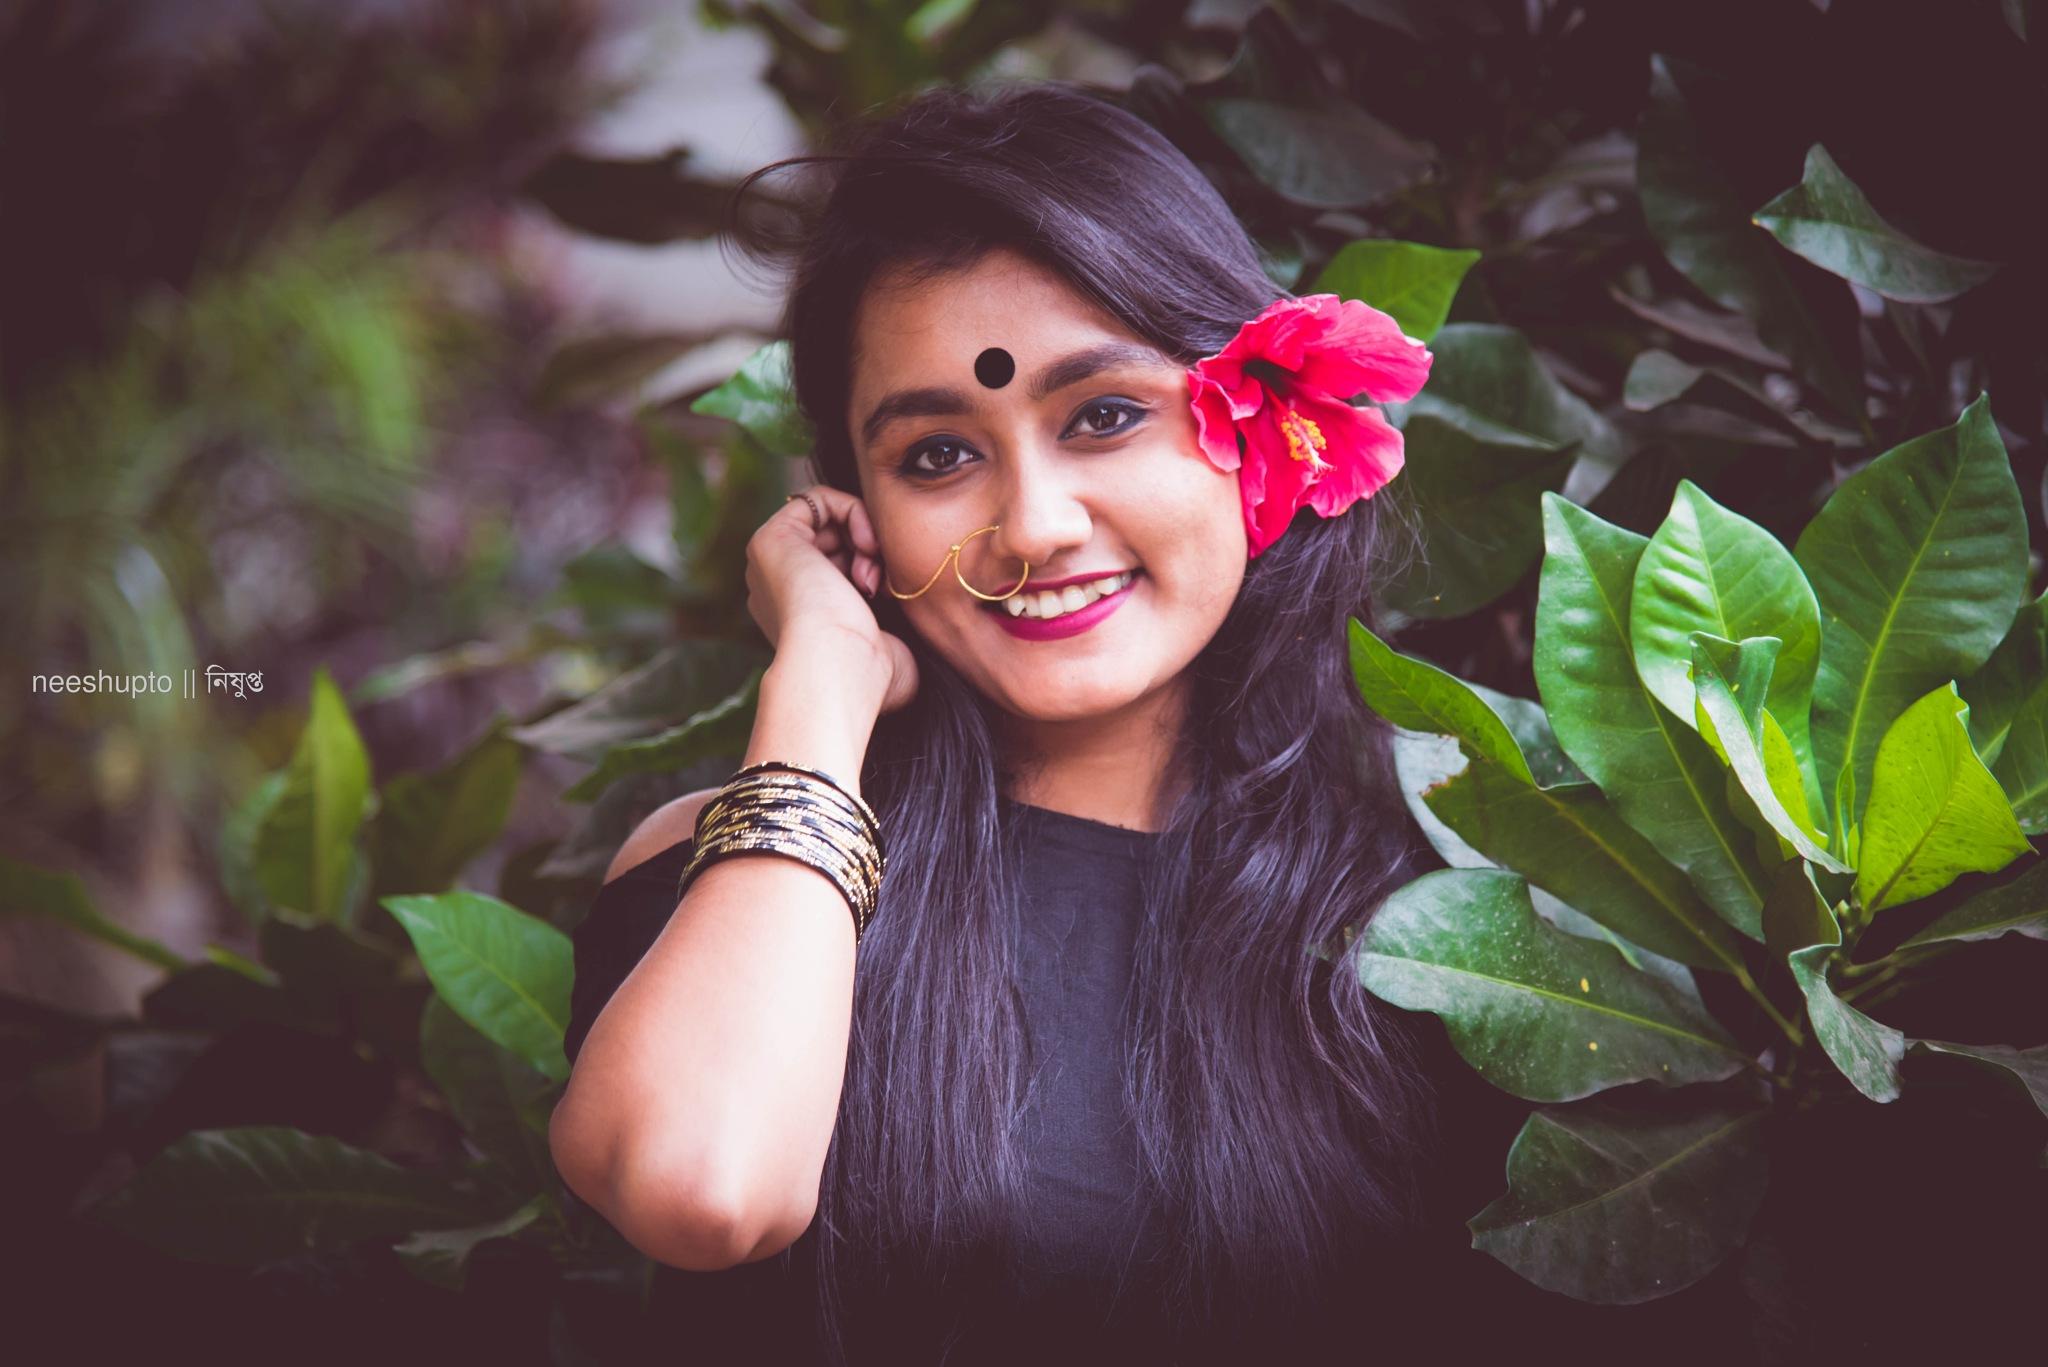 like her smile... by Neeshupto Sagar